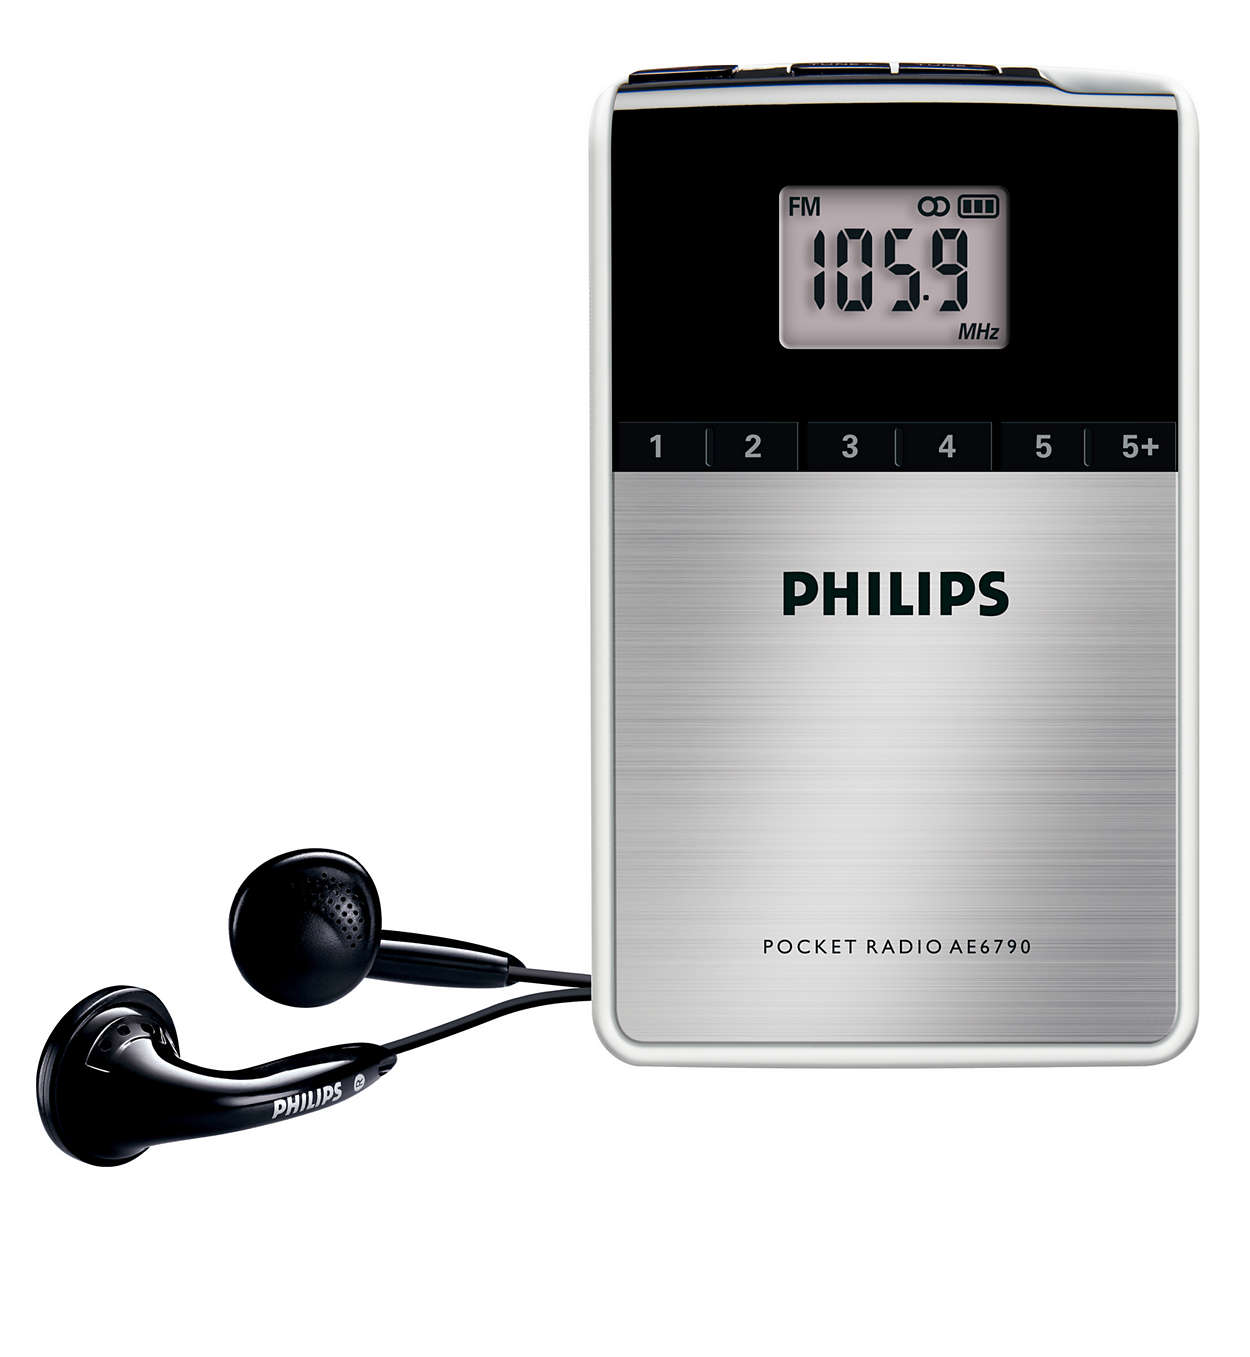 Radio digital în mişcare